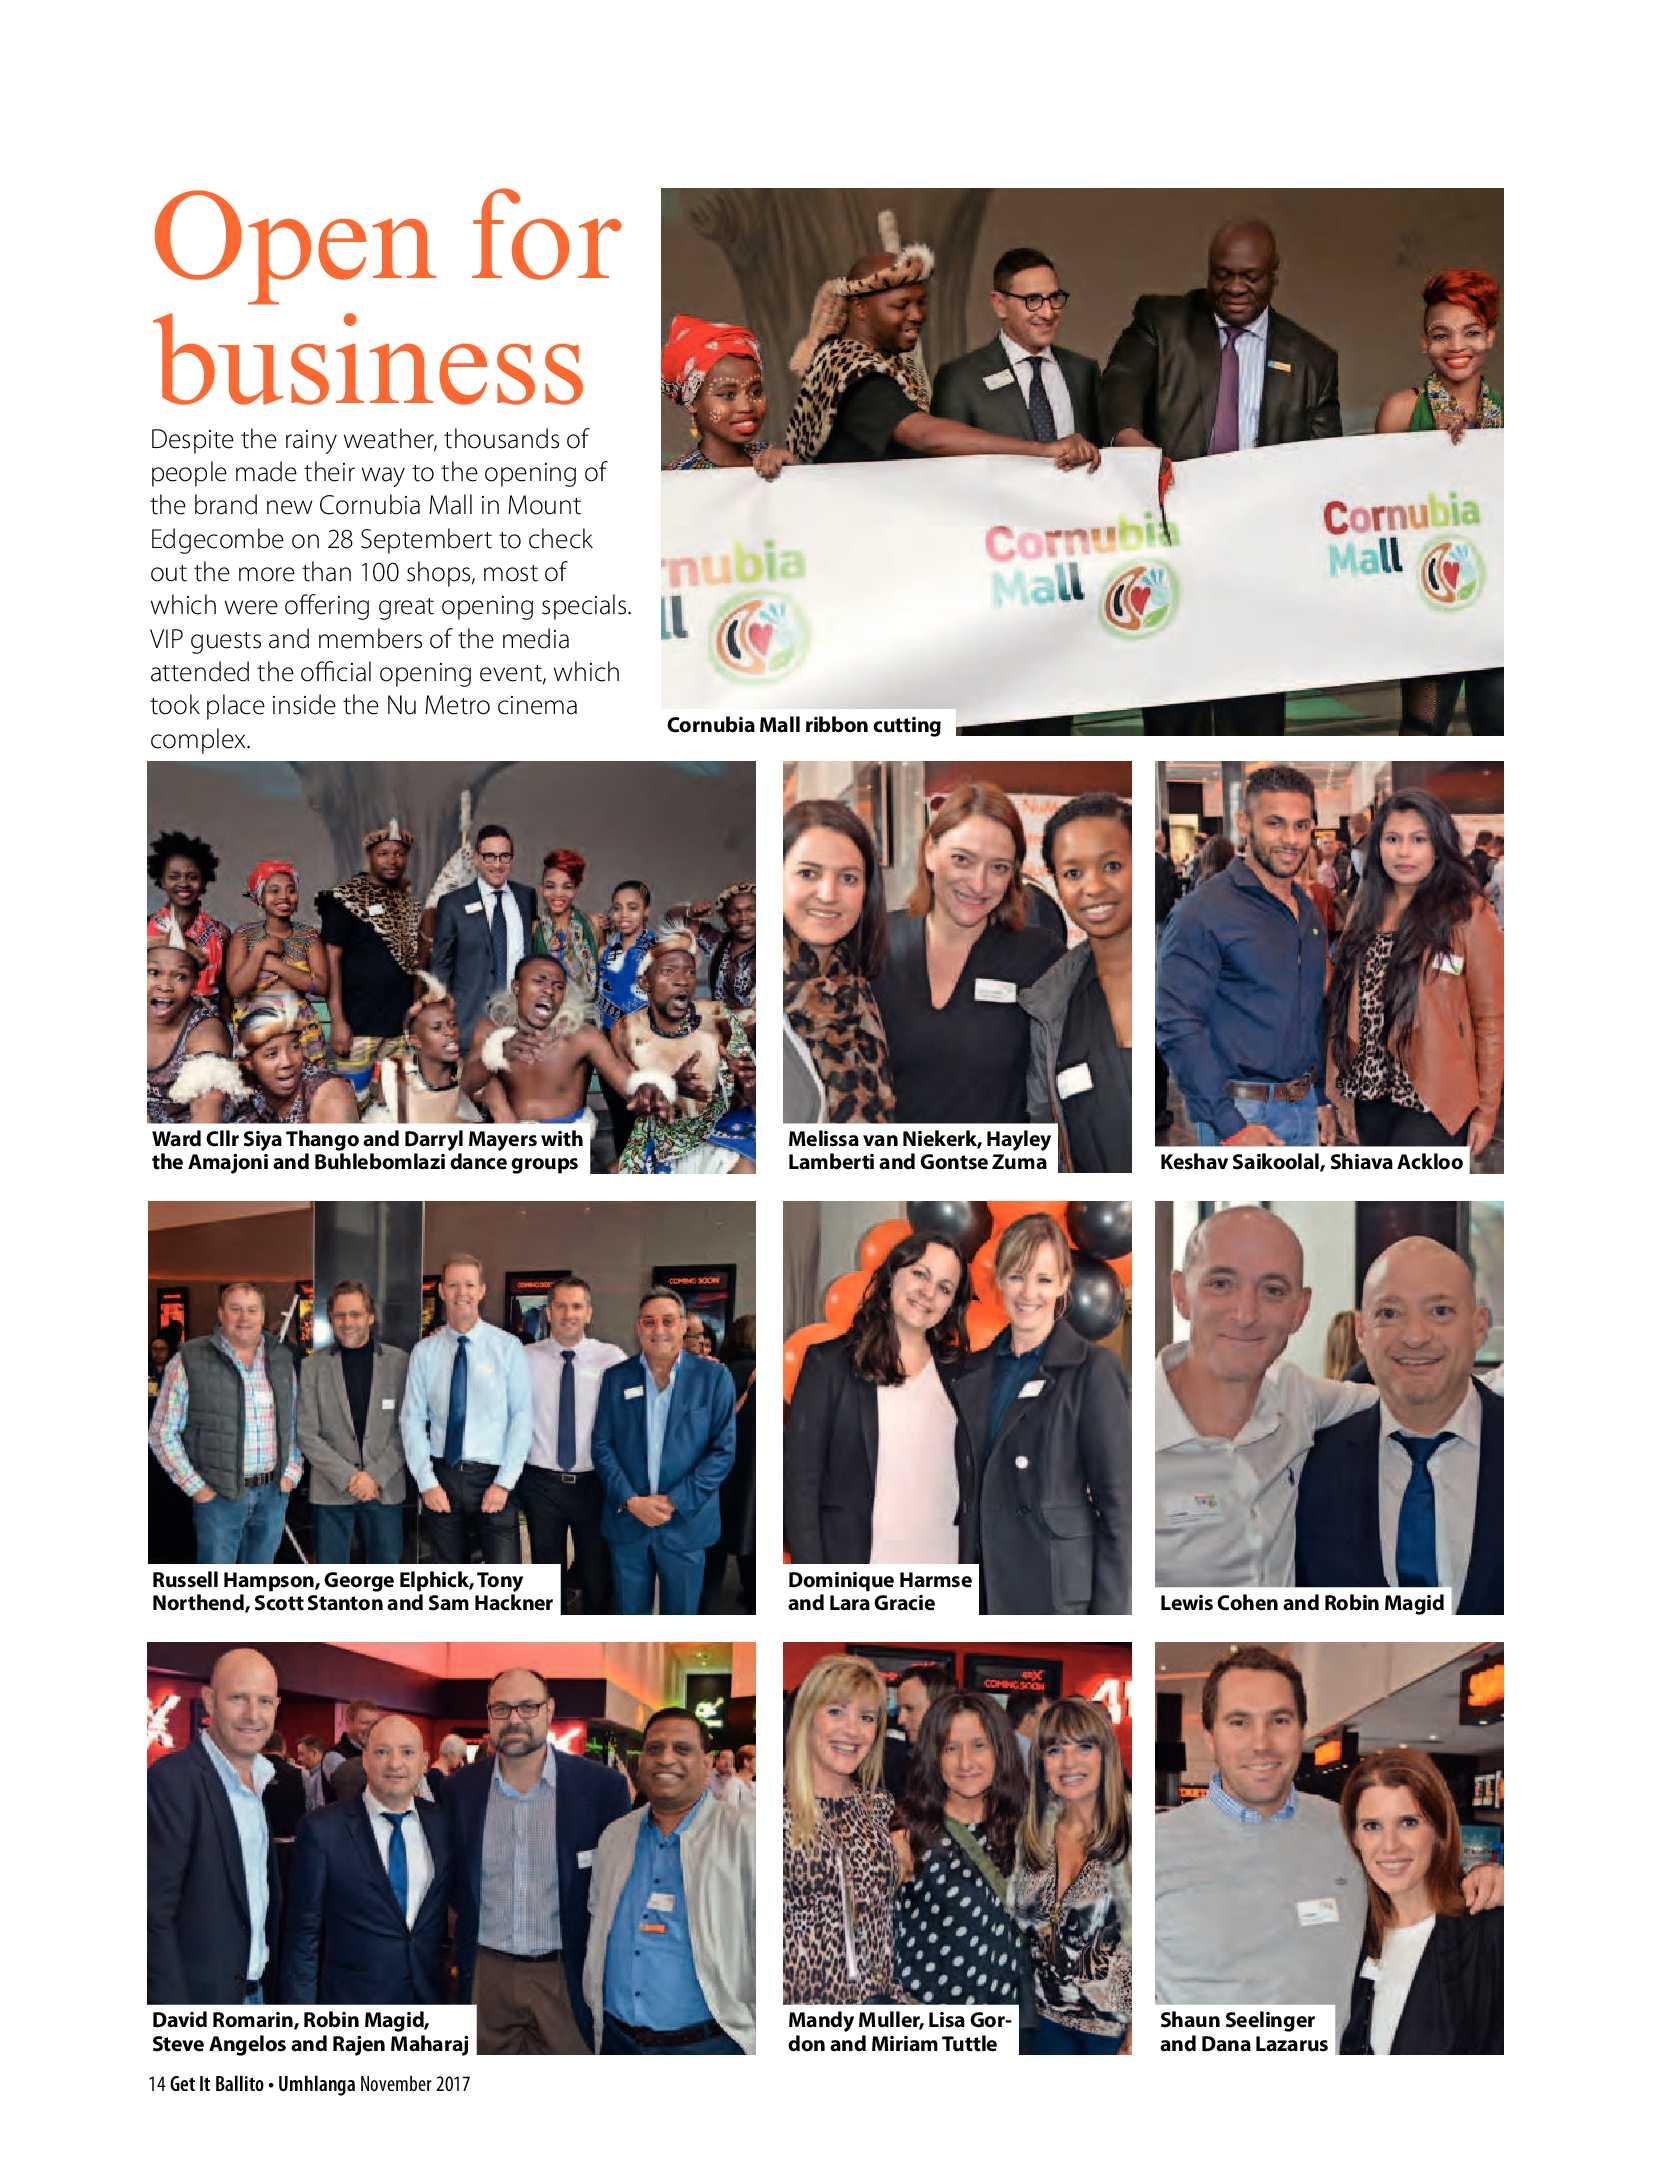 get-magazine-ballitoumhlanga-november-2017-2-epapers-page-16